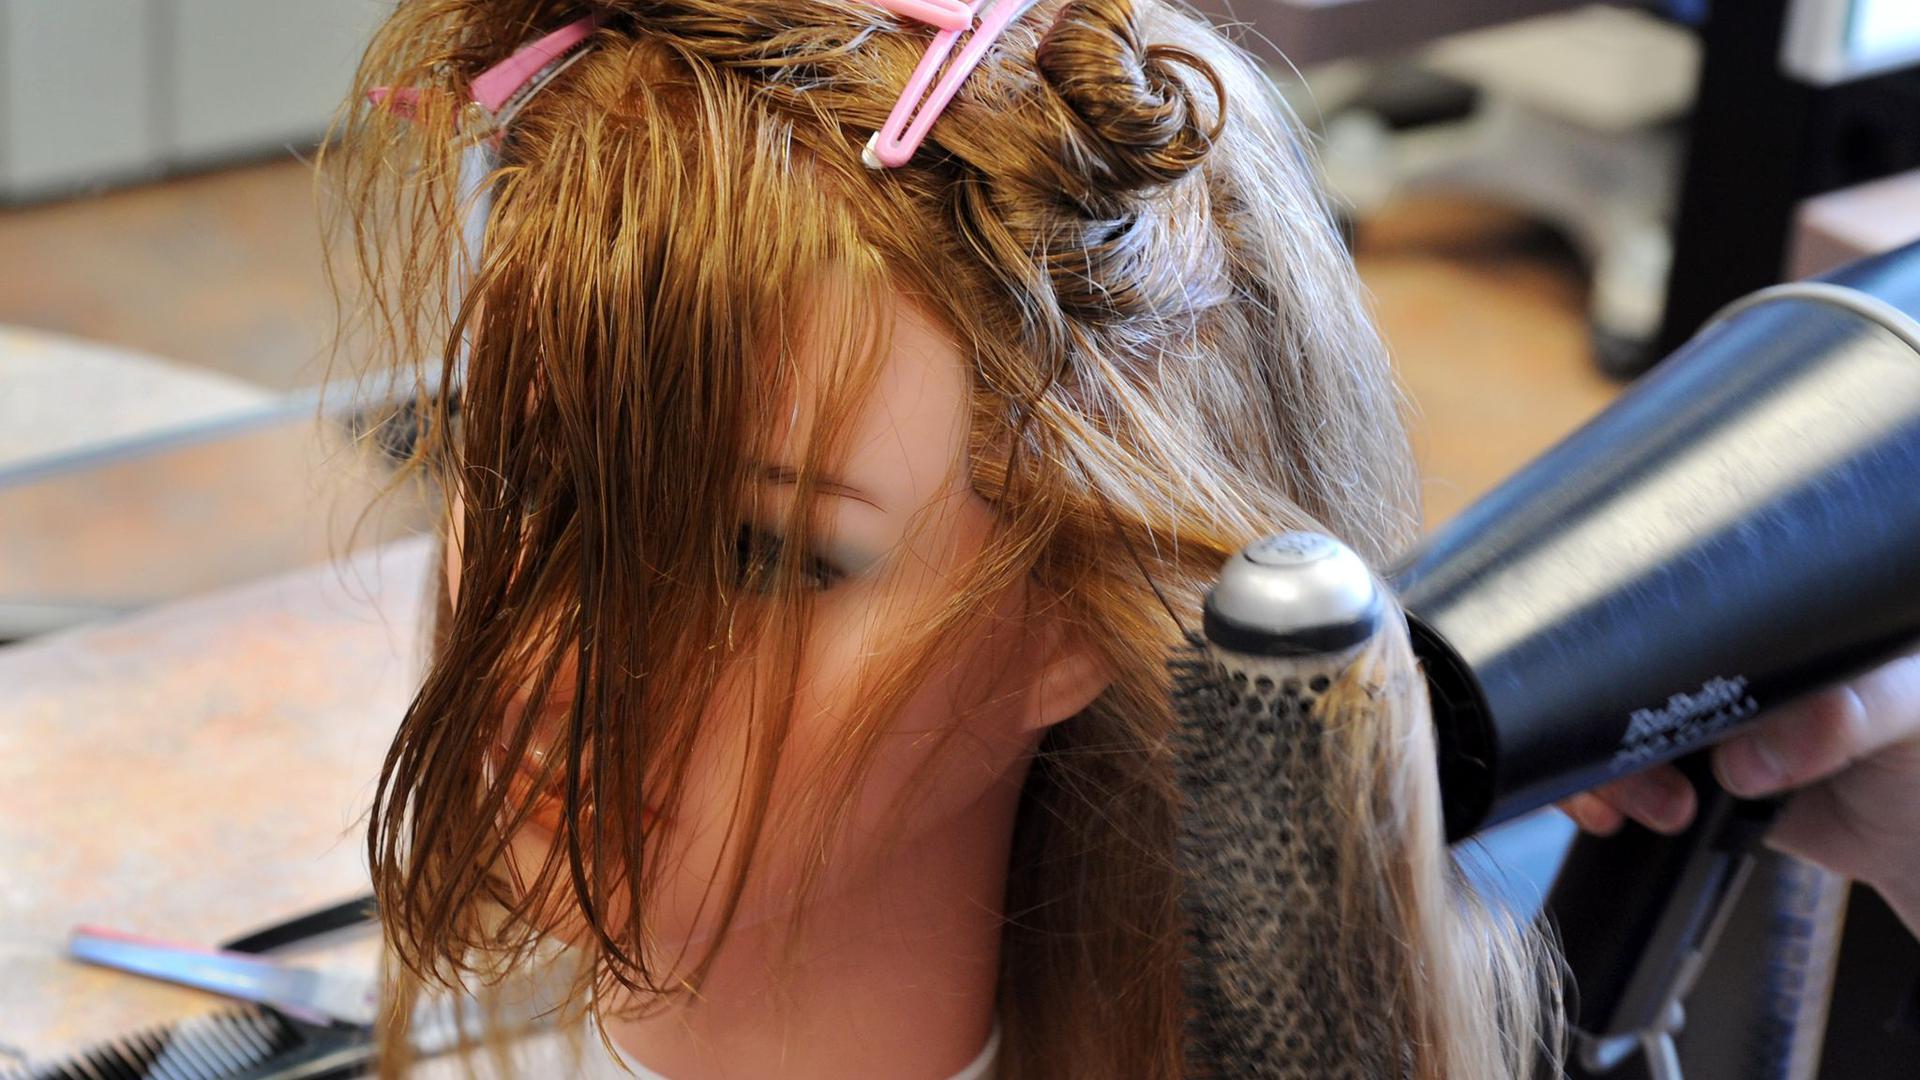 Friseur-Übung an einem Übungskopf.